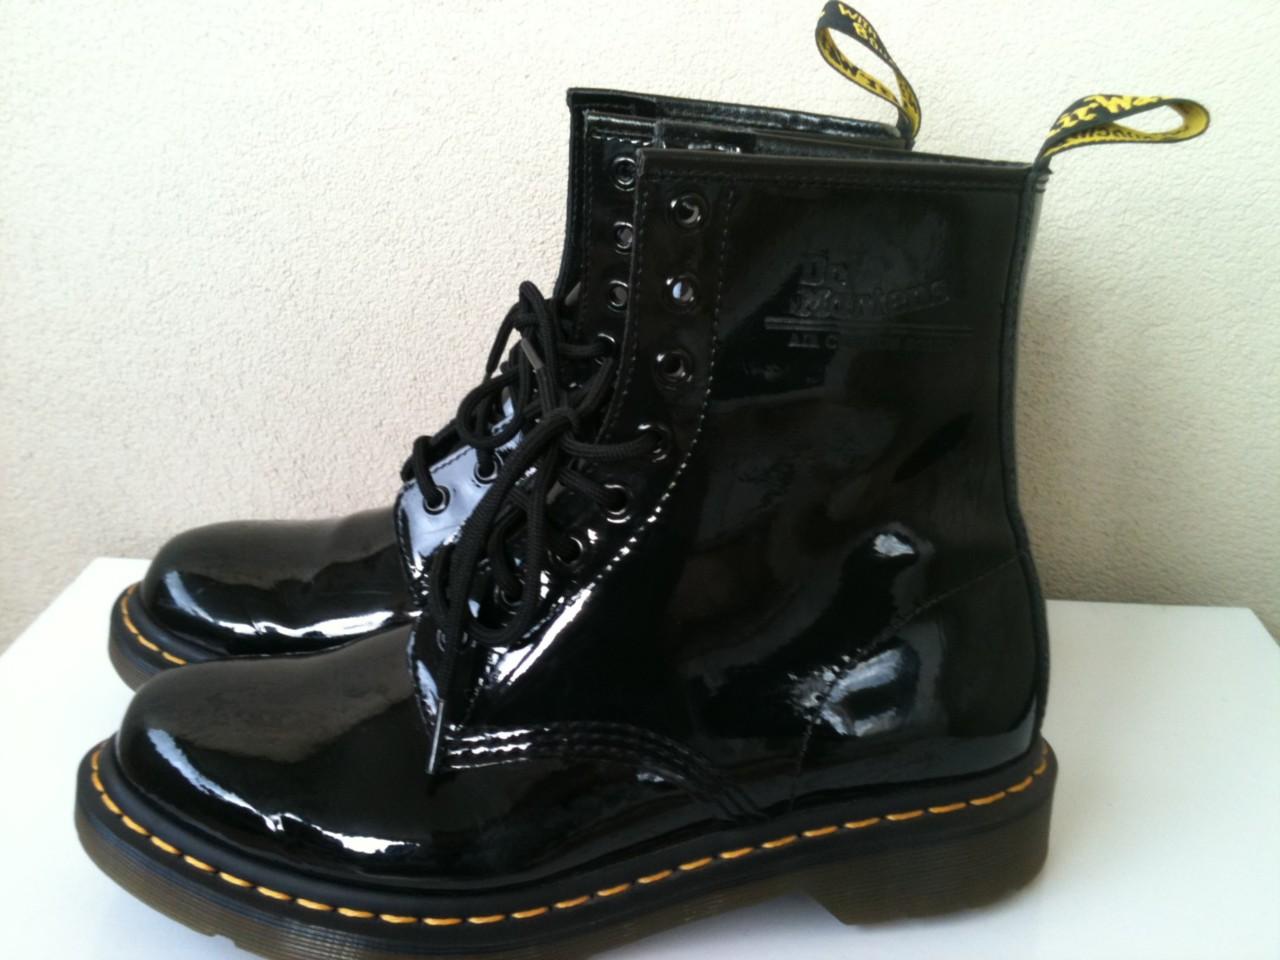 doc martens black patent leather laceup boots uk 7 au 9 ebay